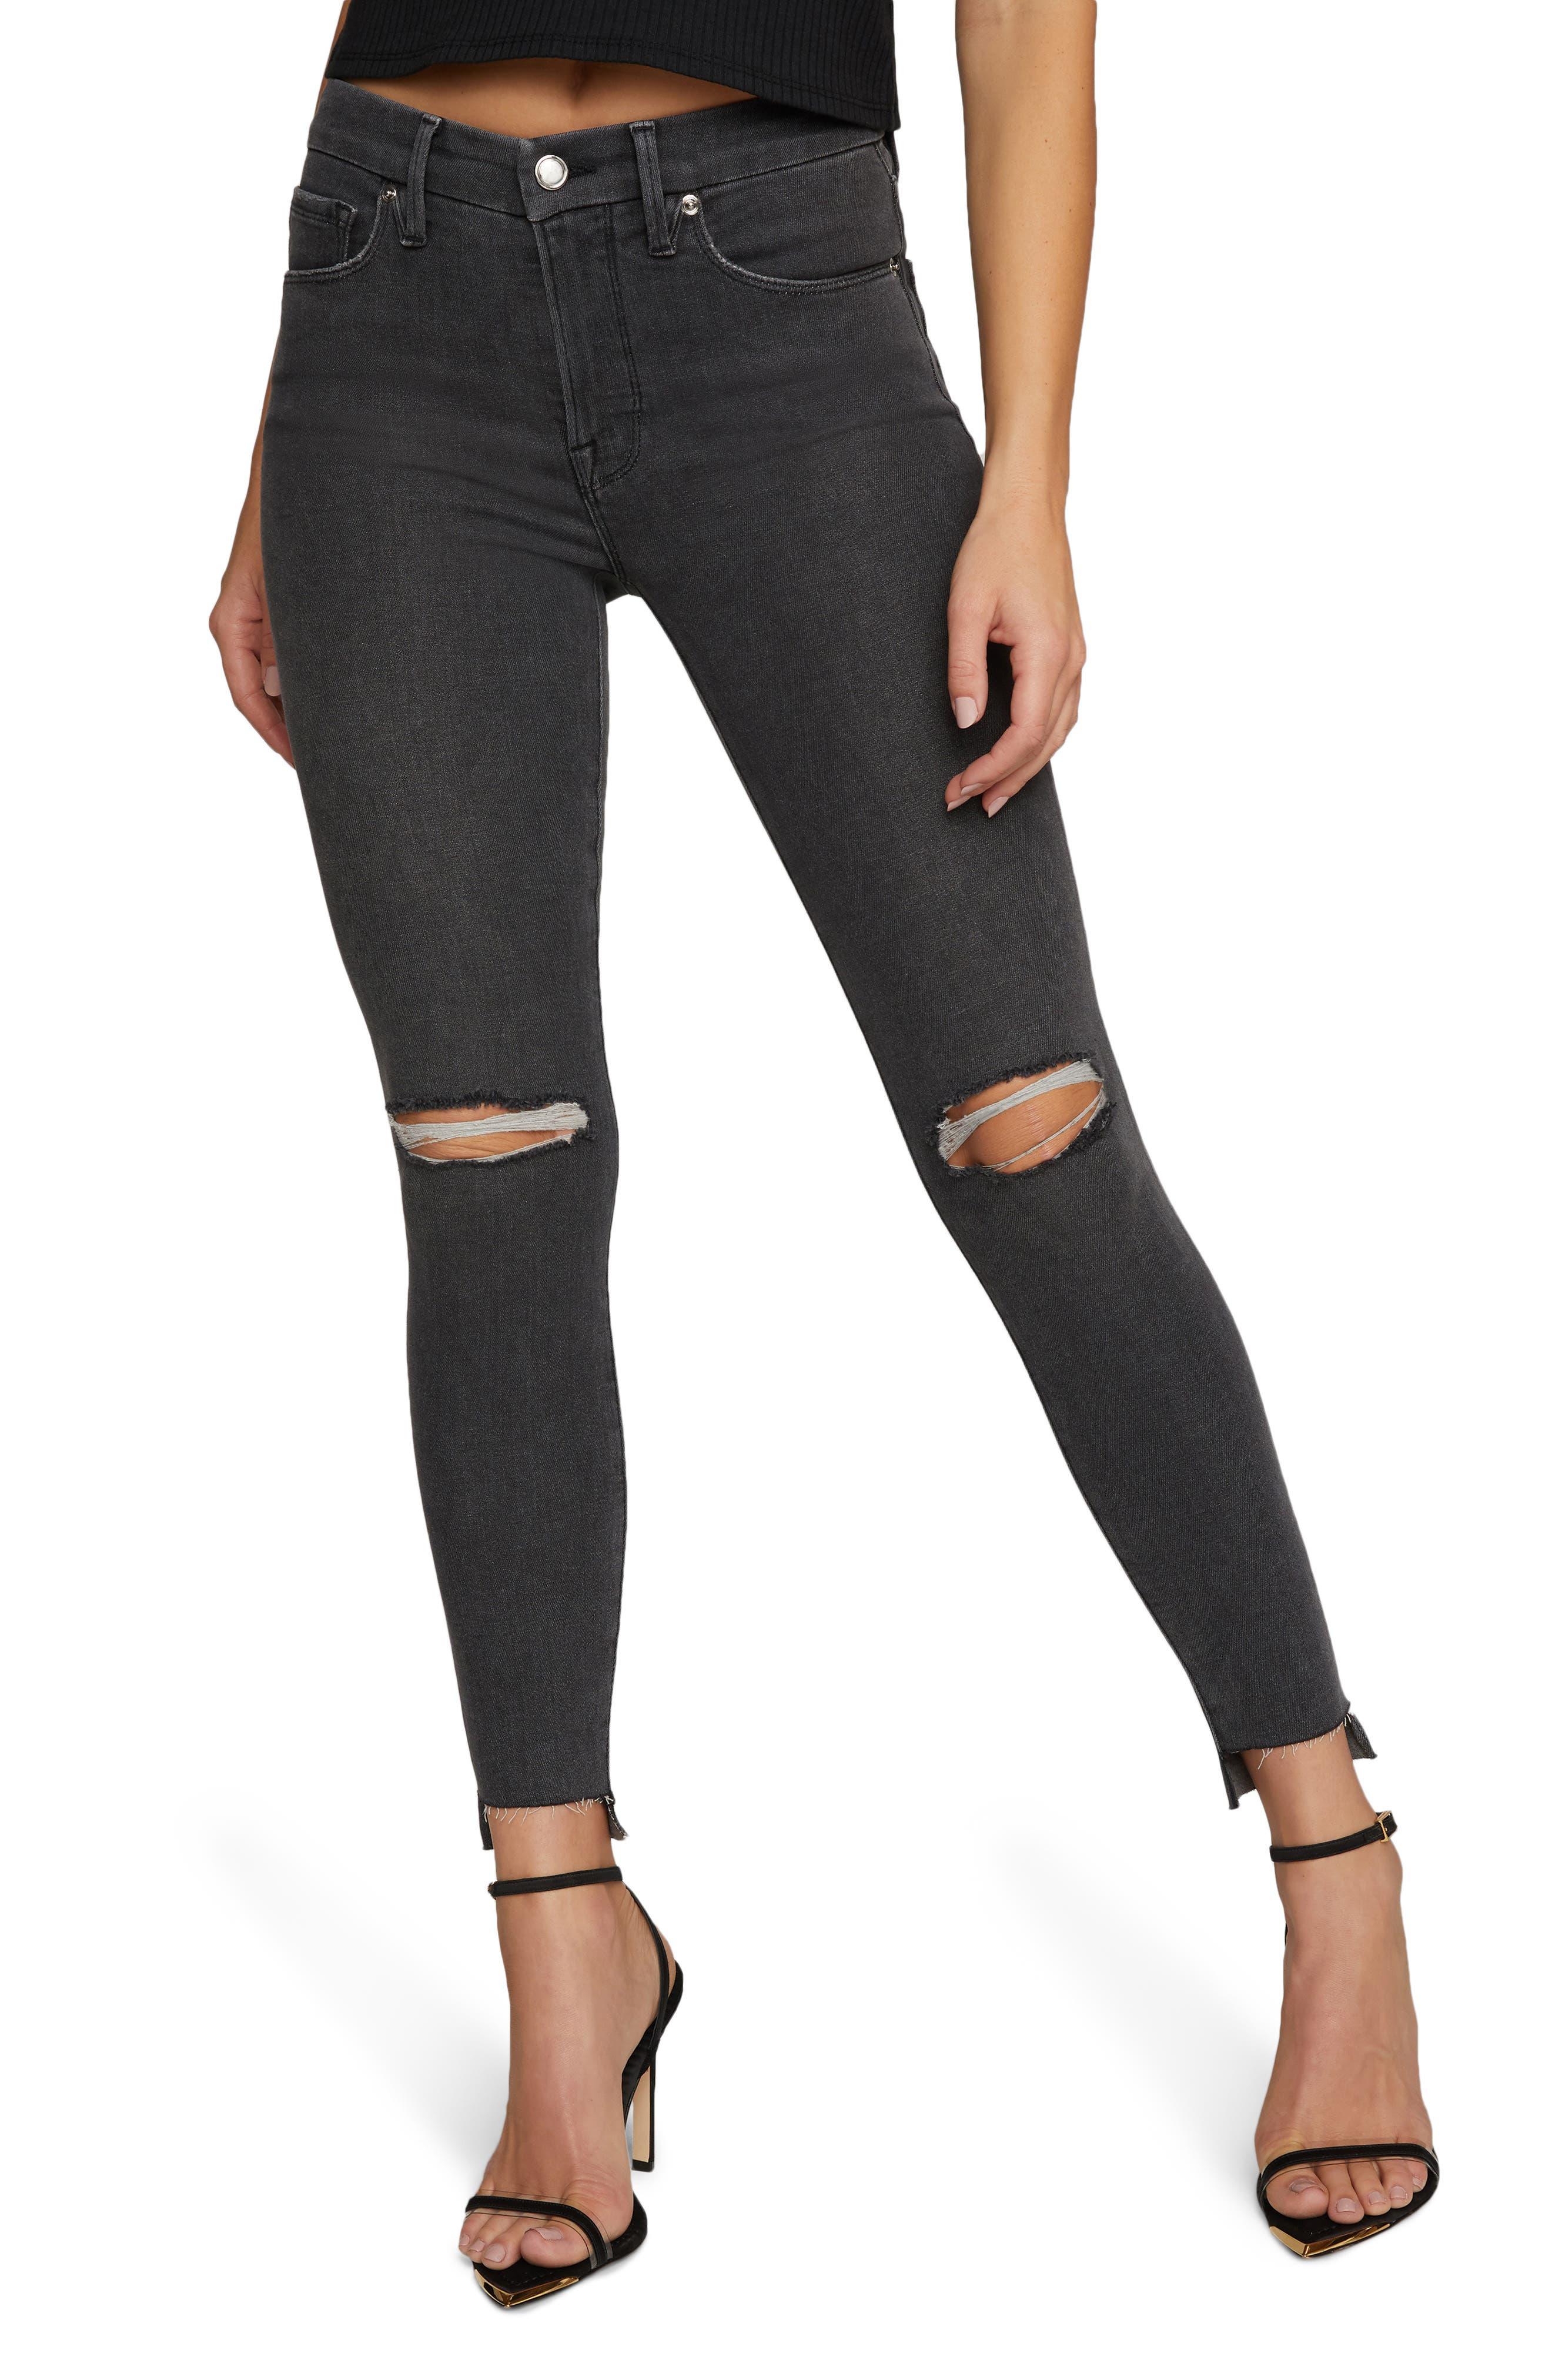 Women's Good American Good Legs Shadow Pockets Ripped Skinny Jeans